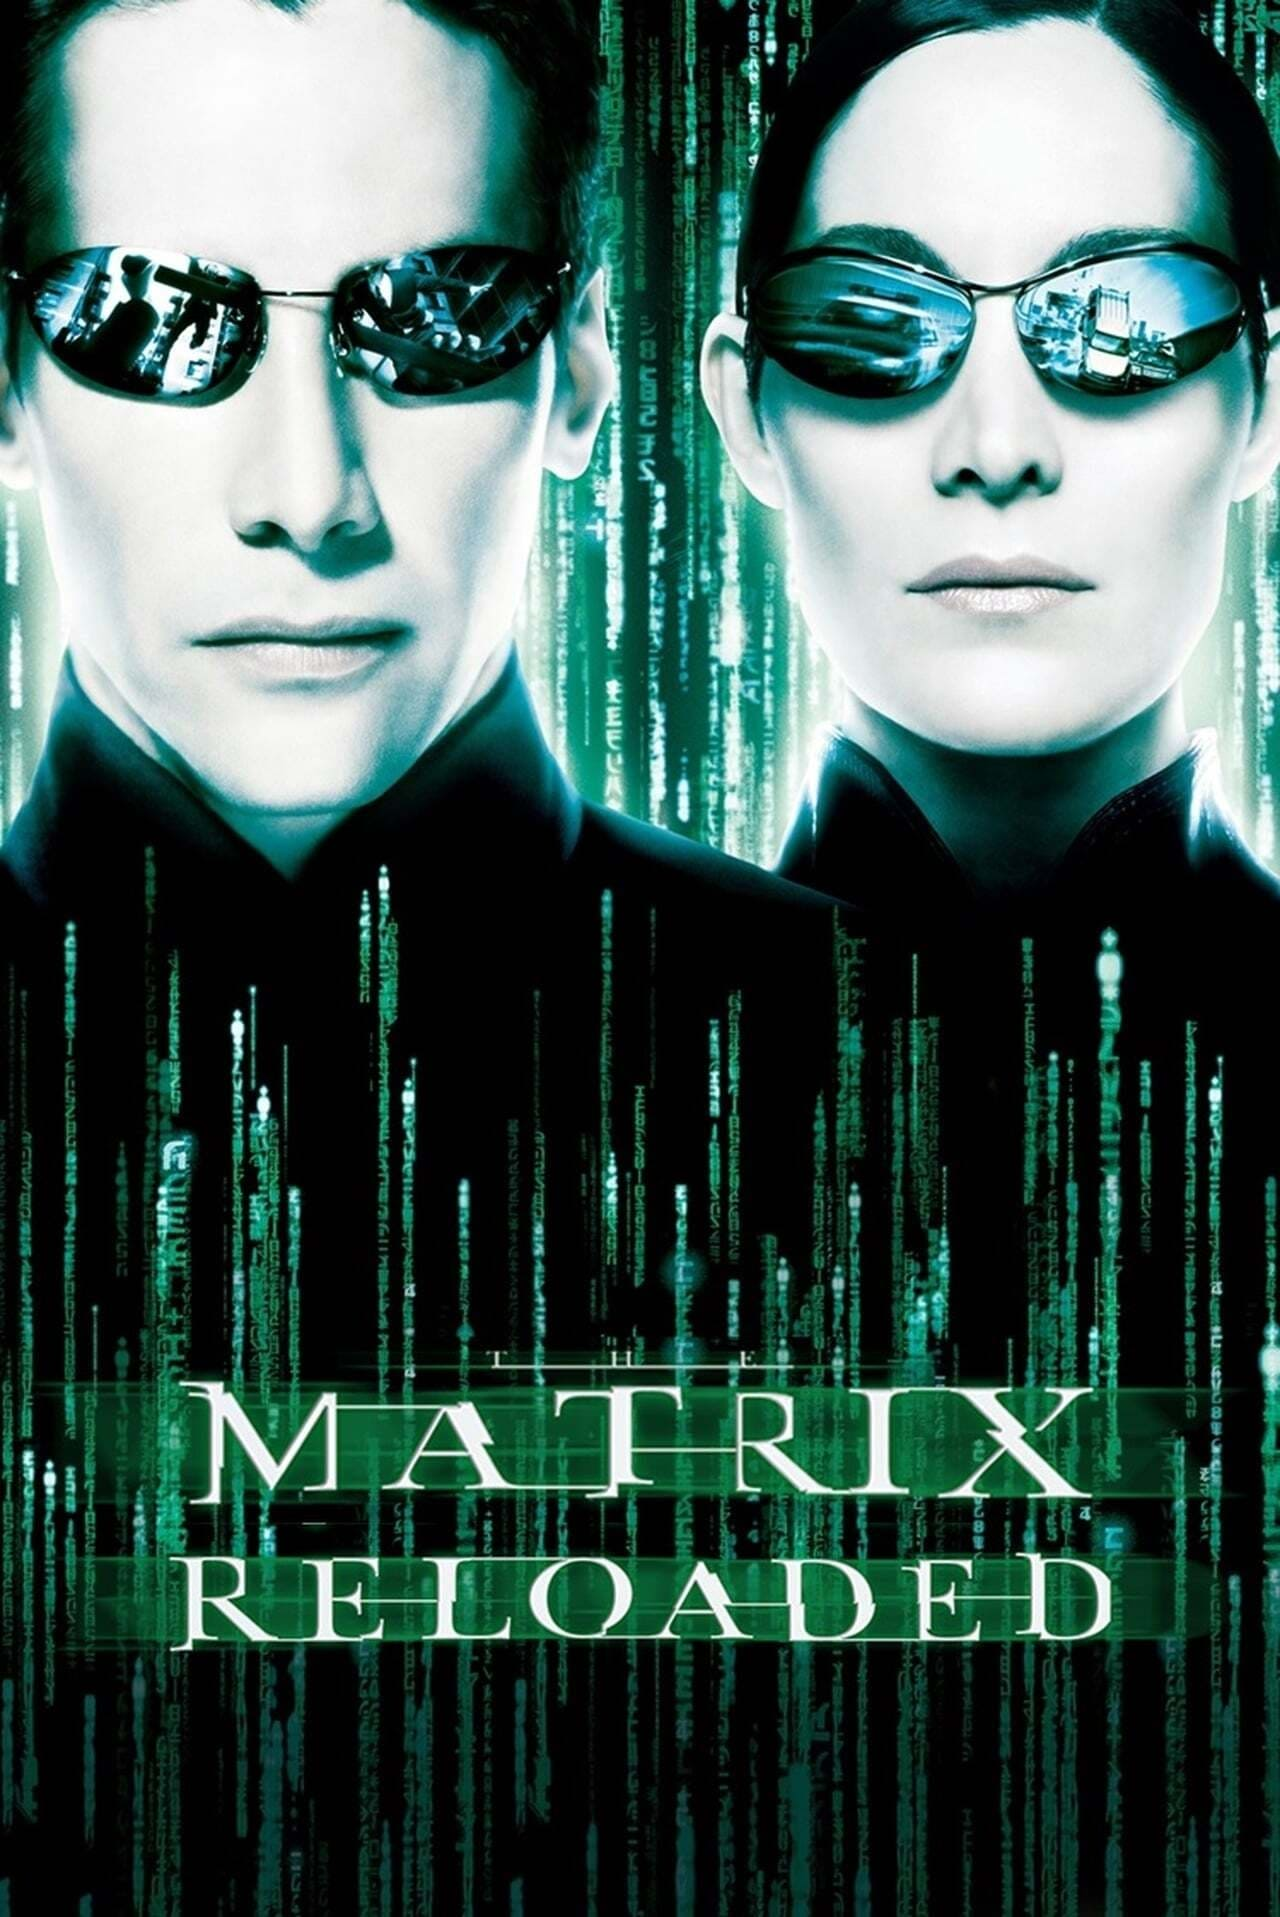 Matrix 2 Reloaded izle, 1080P Türkçe Dublaj izle - 720pizle.org